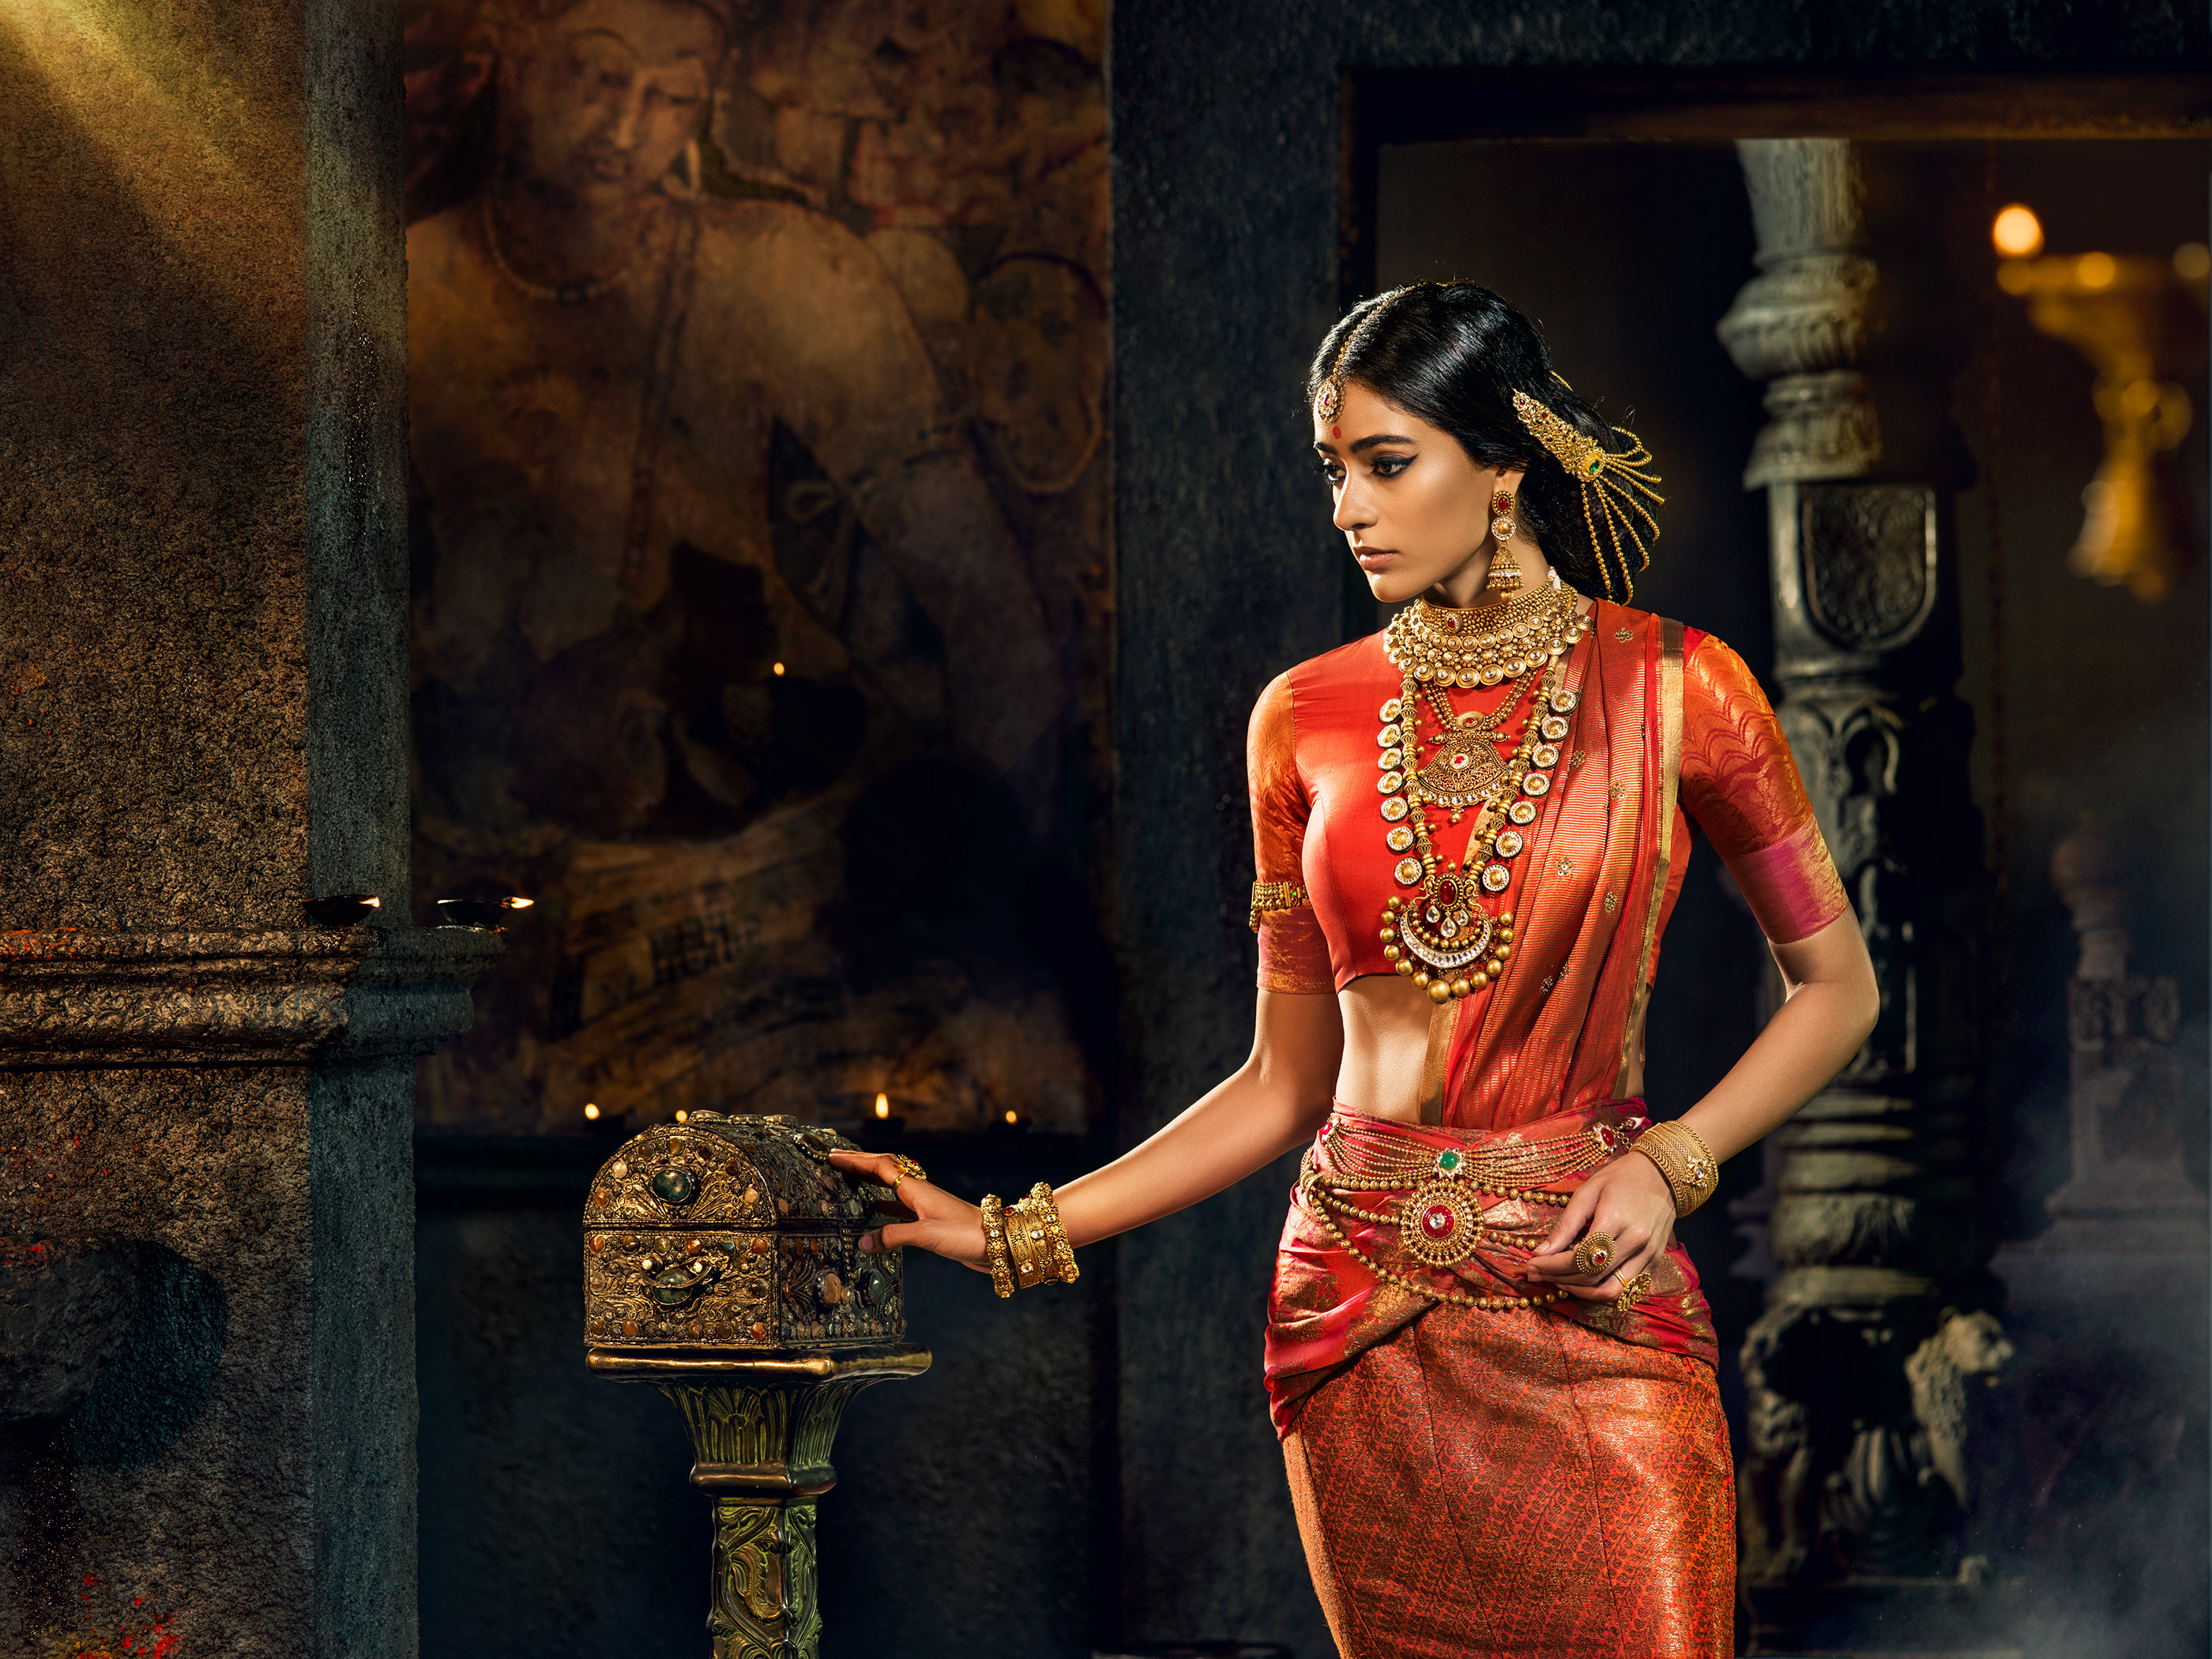 Malabar Gold & Diamonds Brides Of India 2017 - GUPTA on Behance